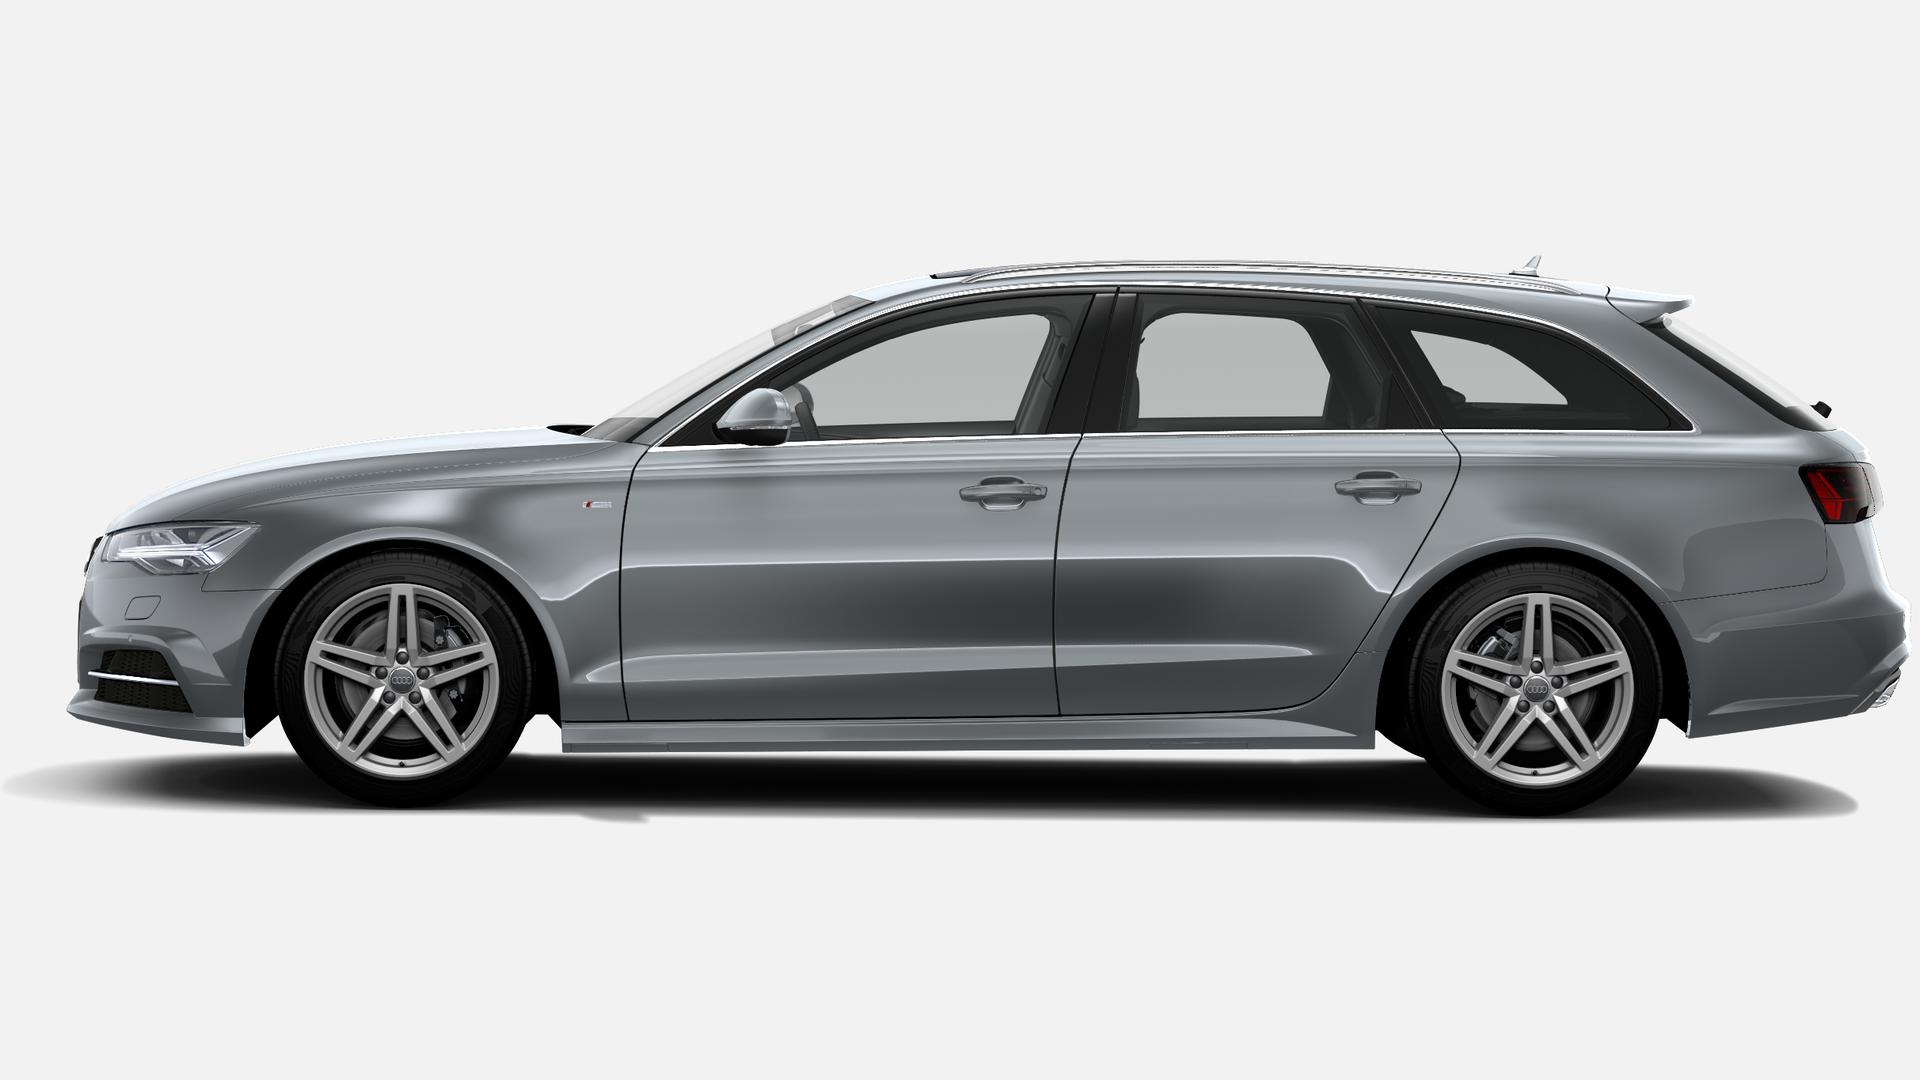 Audi A6 Avant 2.0 TDI ultra S line edition S tronic 140 kW (190 CV)